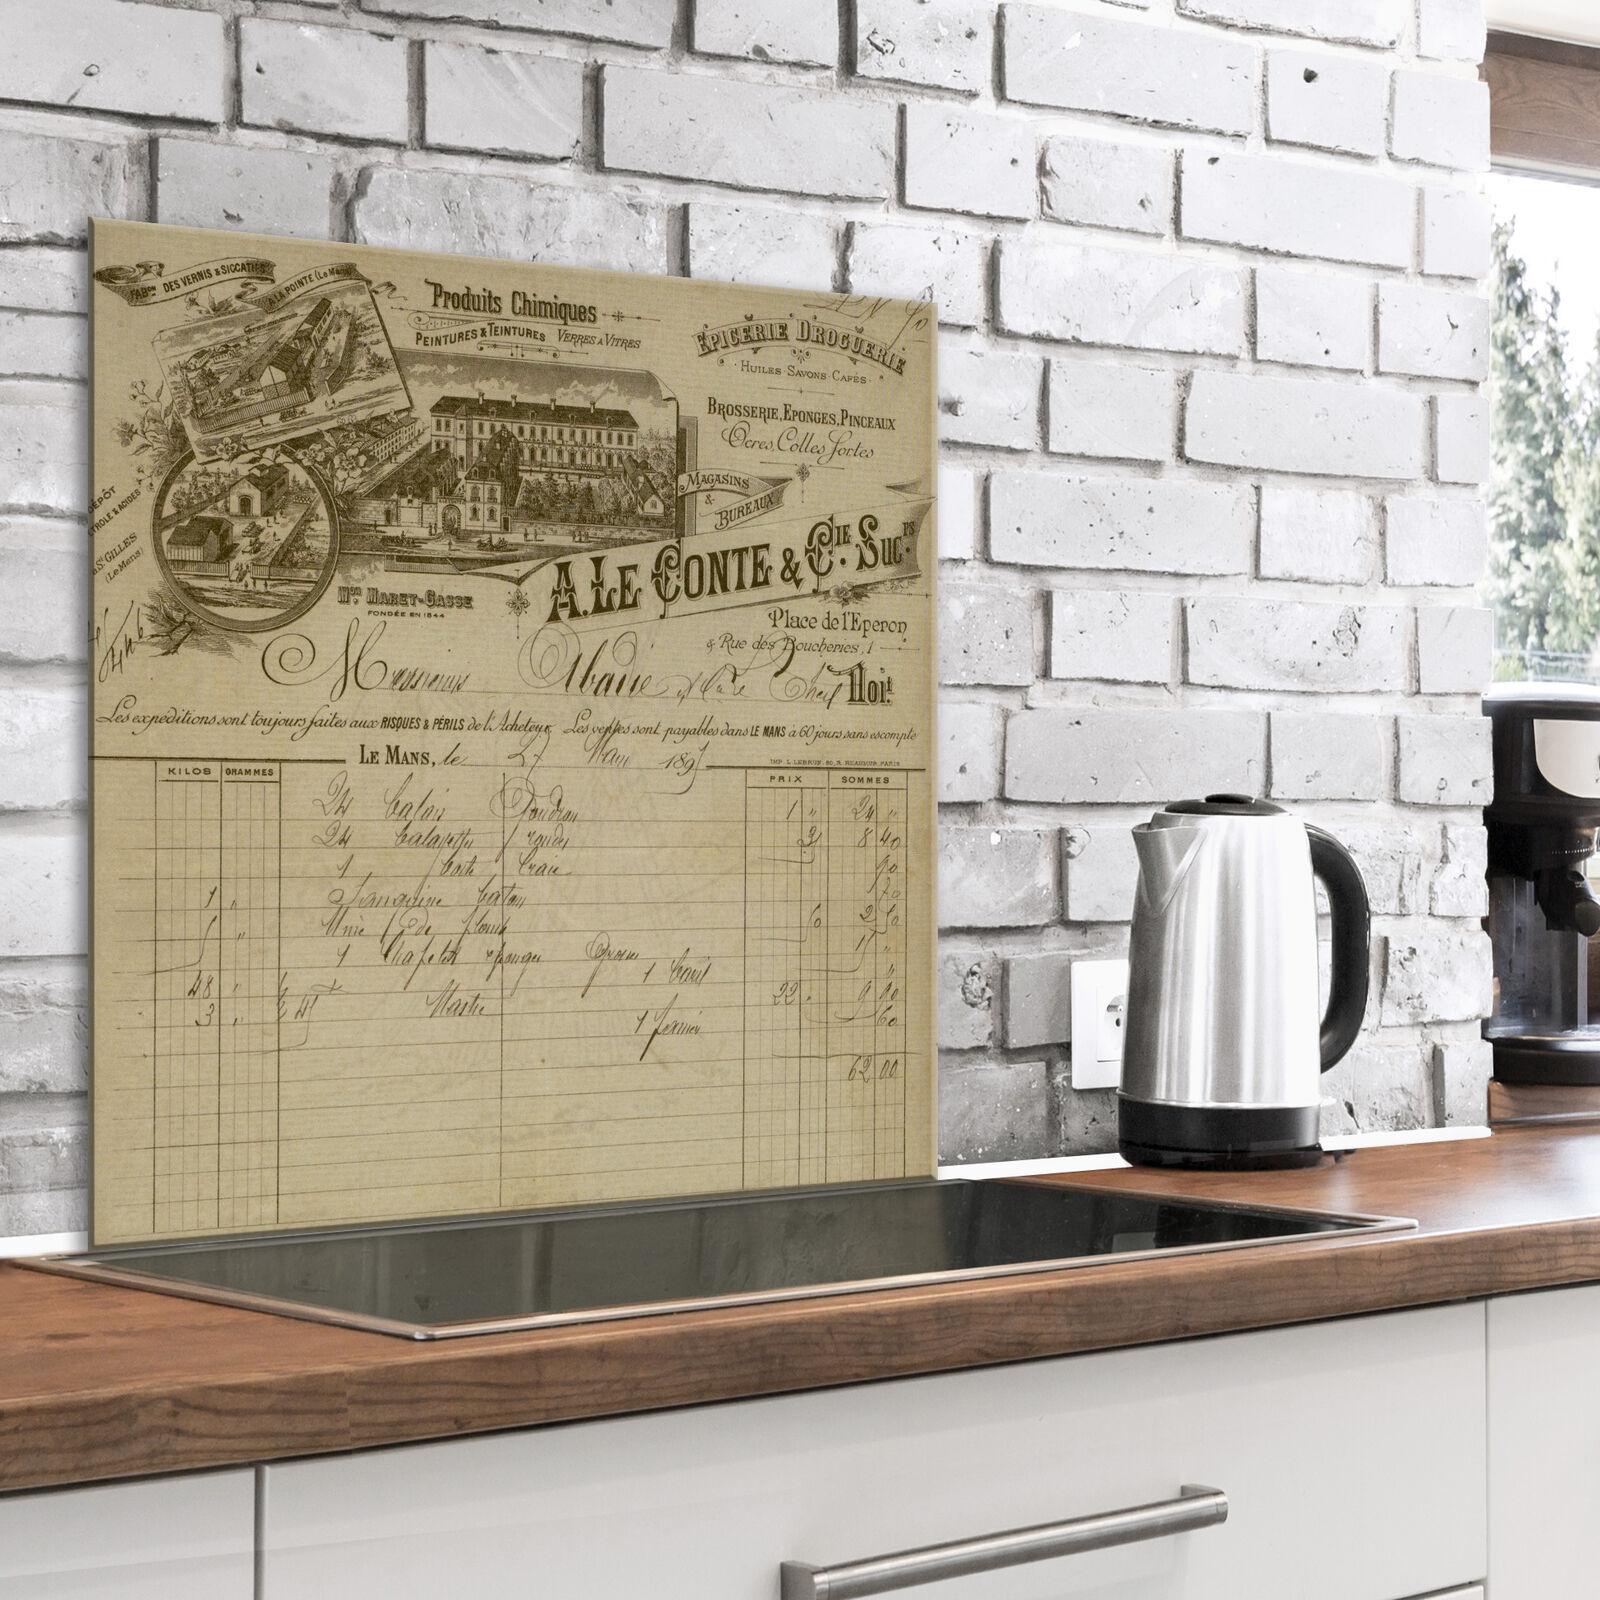 Glasbild 80x80 cm Wandbild Glas Küche Küchenrückwand Spritzschutz n-A-0990-aq-a